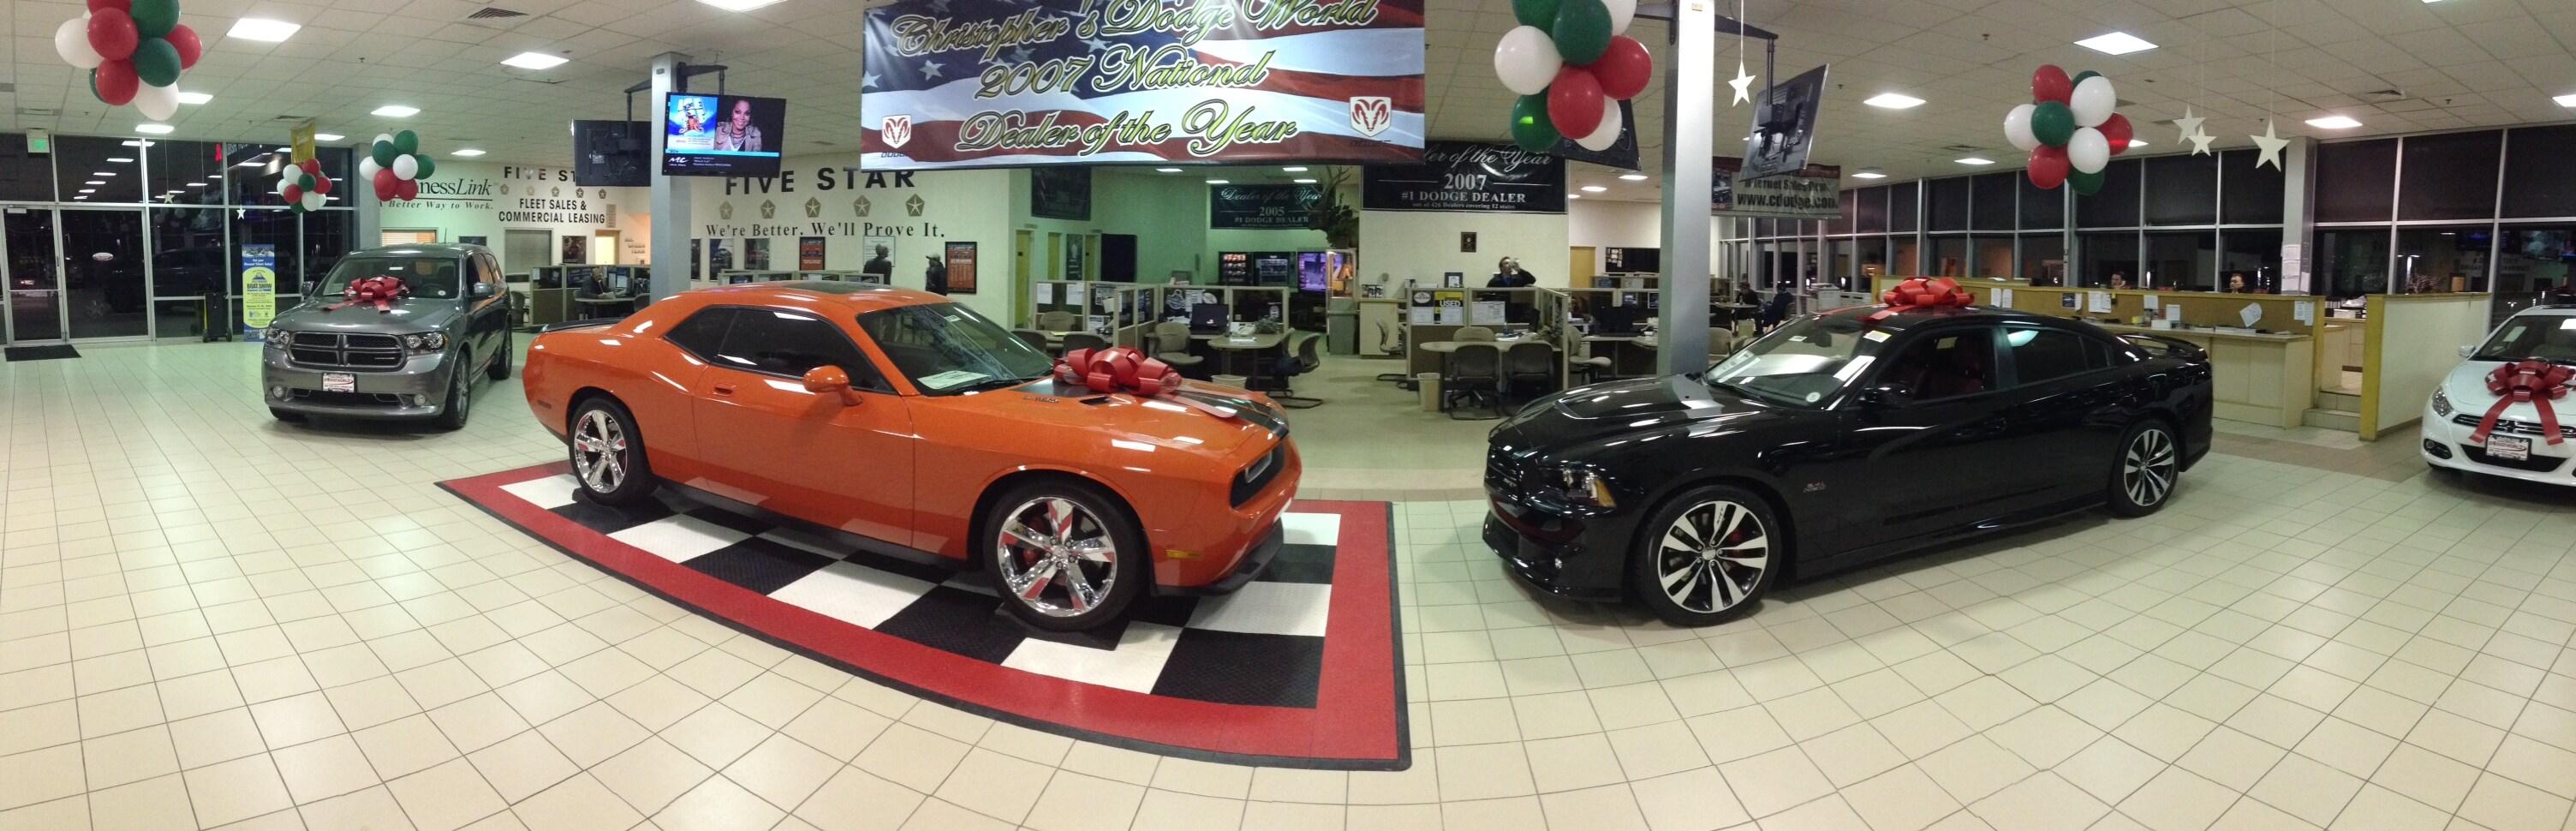 ram dodge showroom denver golden colorado area. Cars Review. Best American Auto & Cars Review